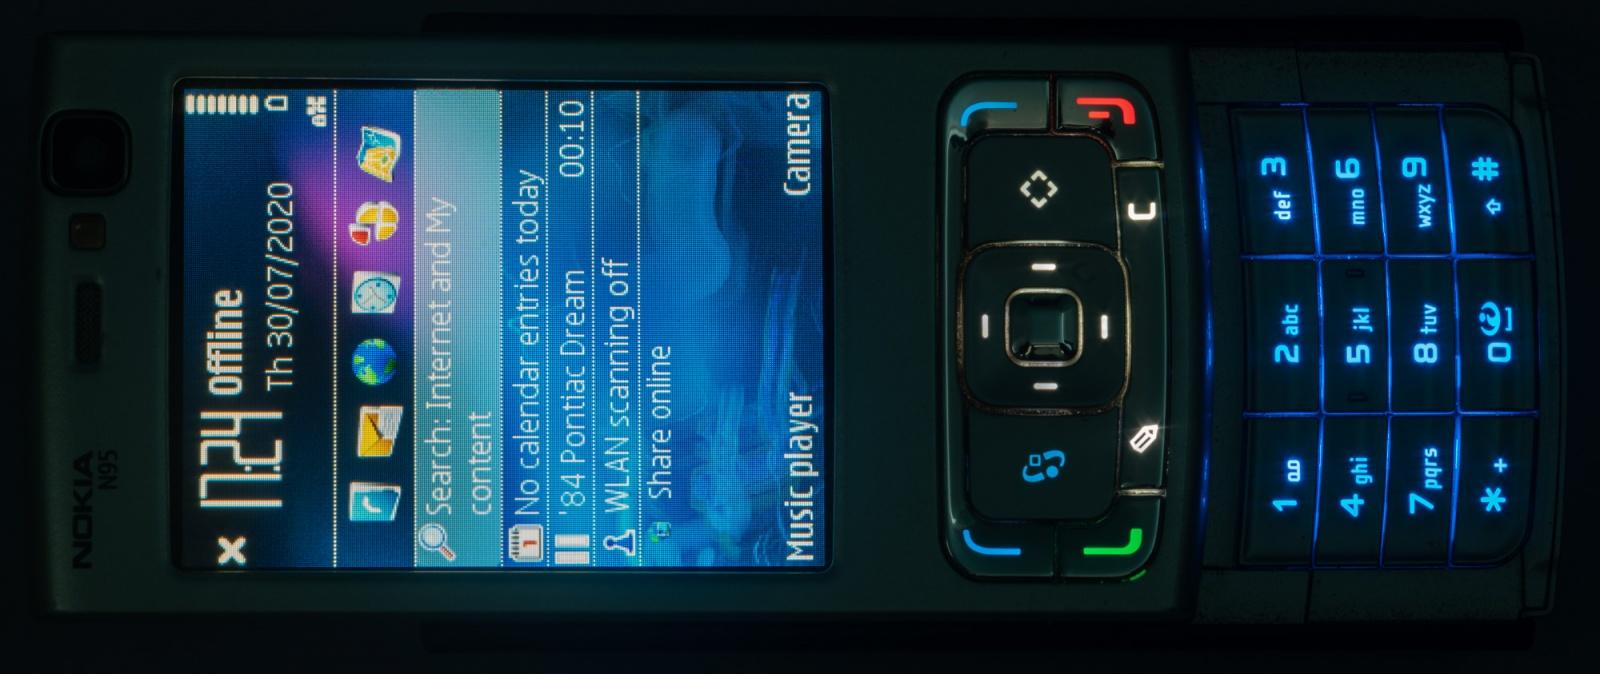 Nokia N95, лучший смартфон старой школы - 15